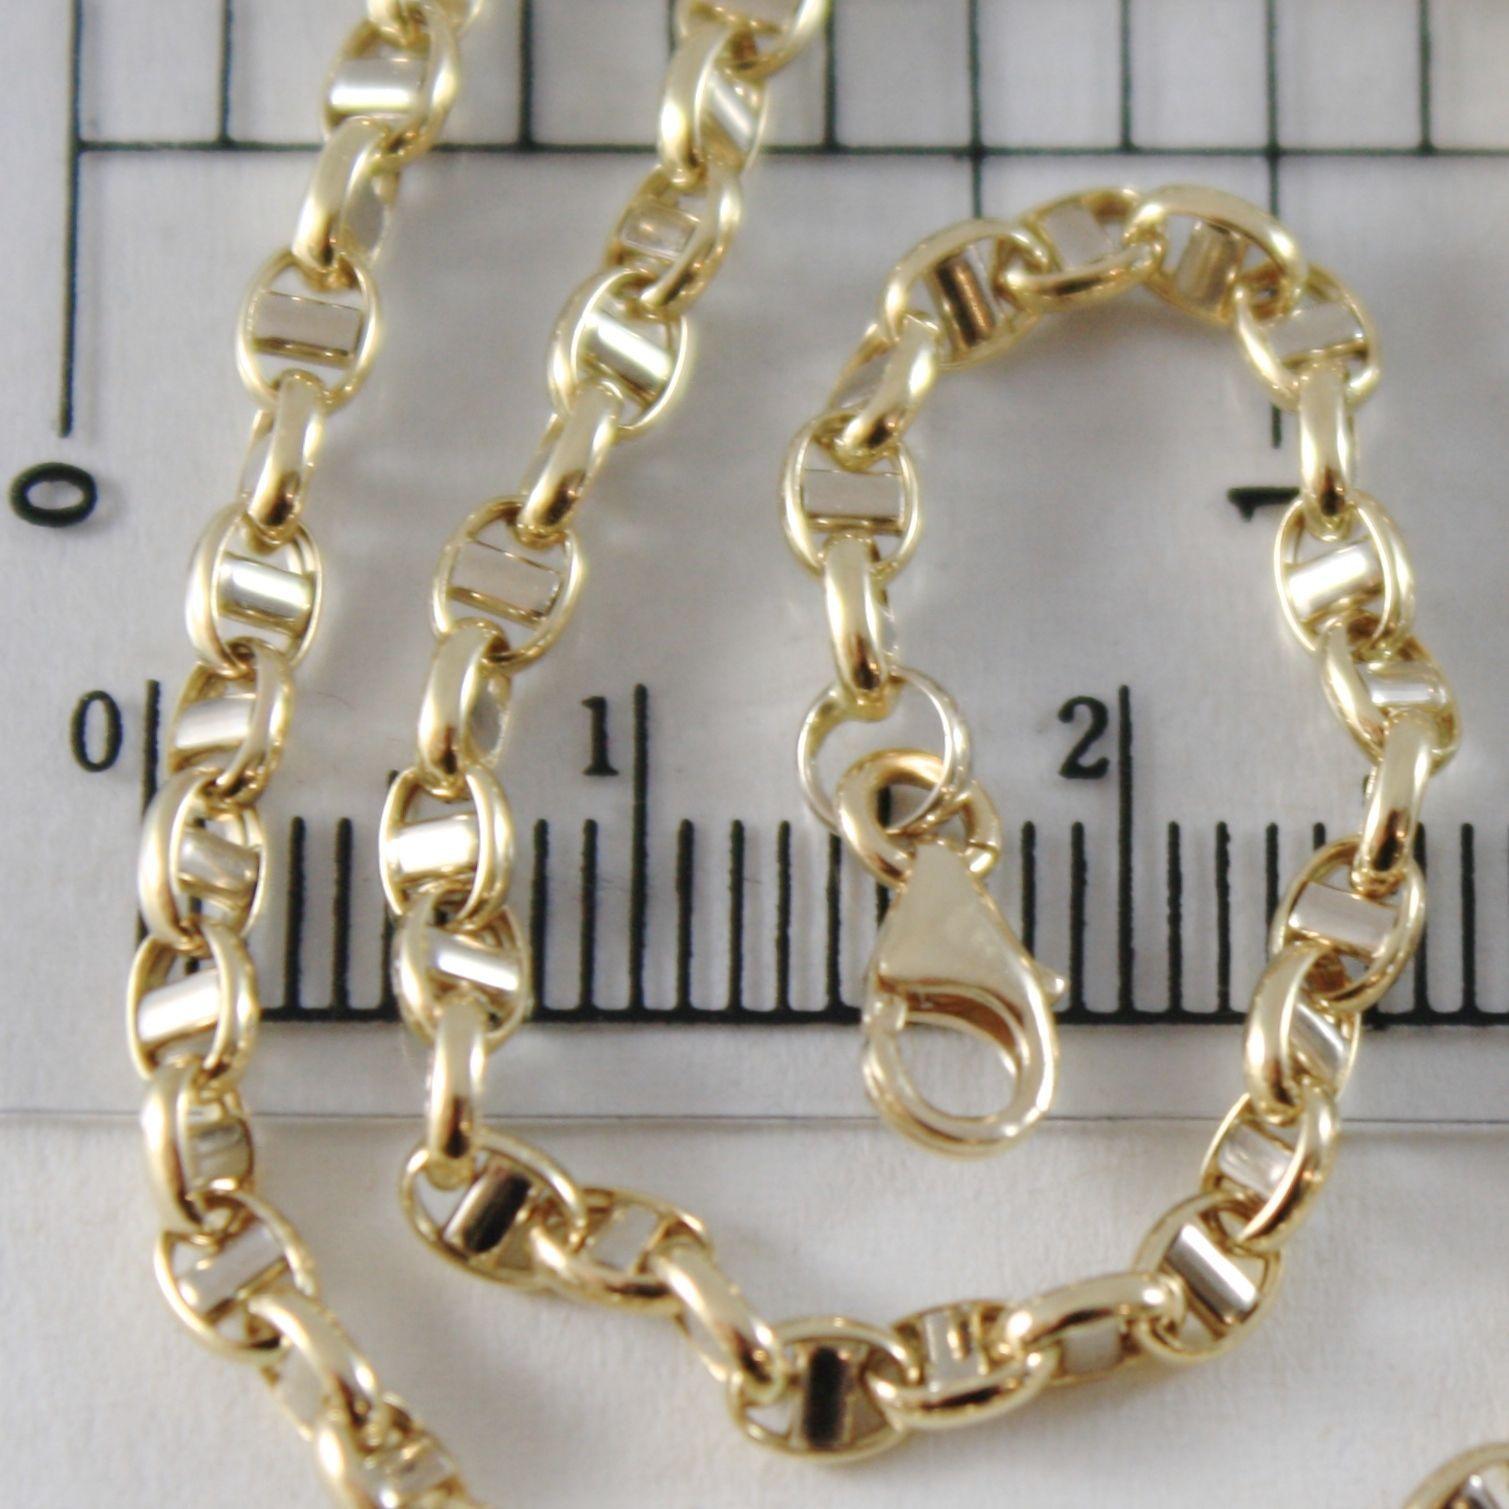 BRACELET YELLOW GOLD 0,5 WHITE 750 18K,21 CM,3 MM,MARINARA CROSSPIECE,ITALY